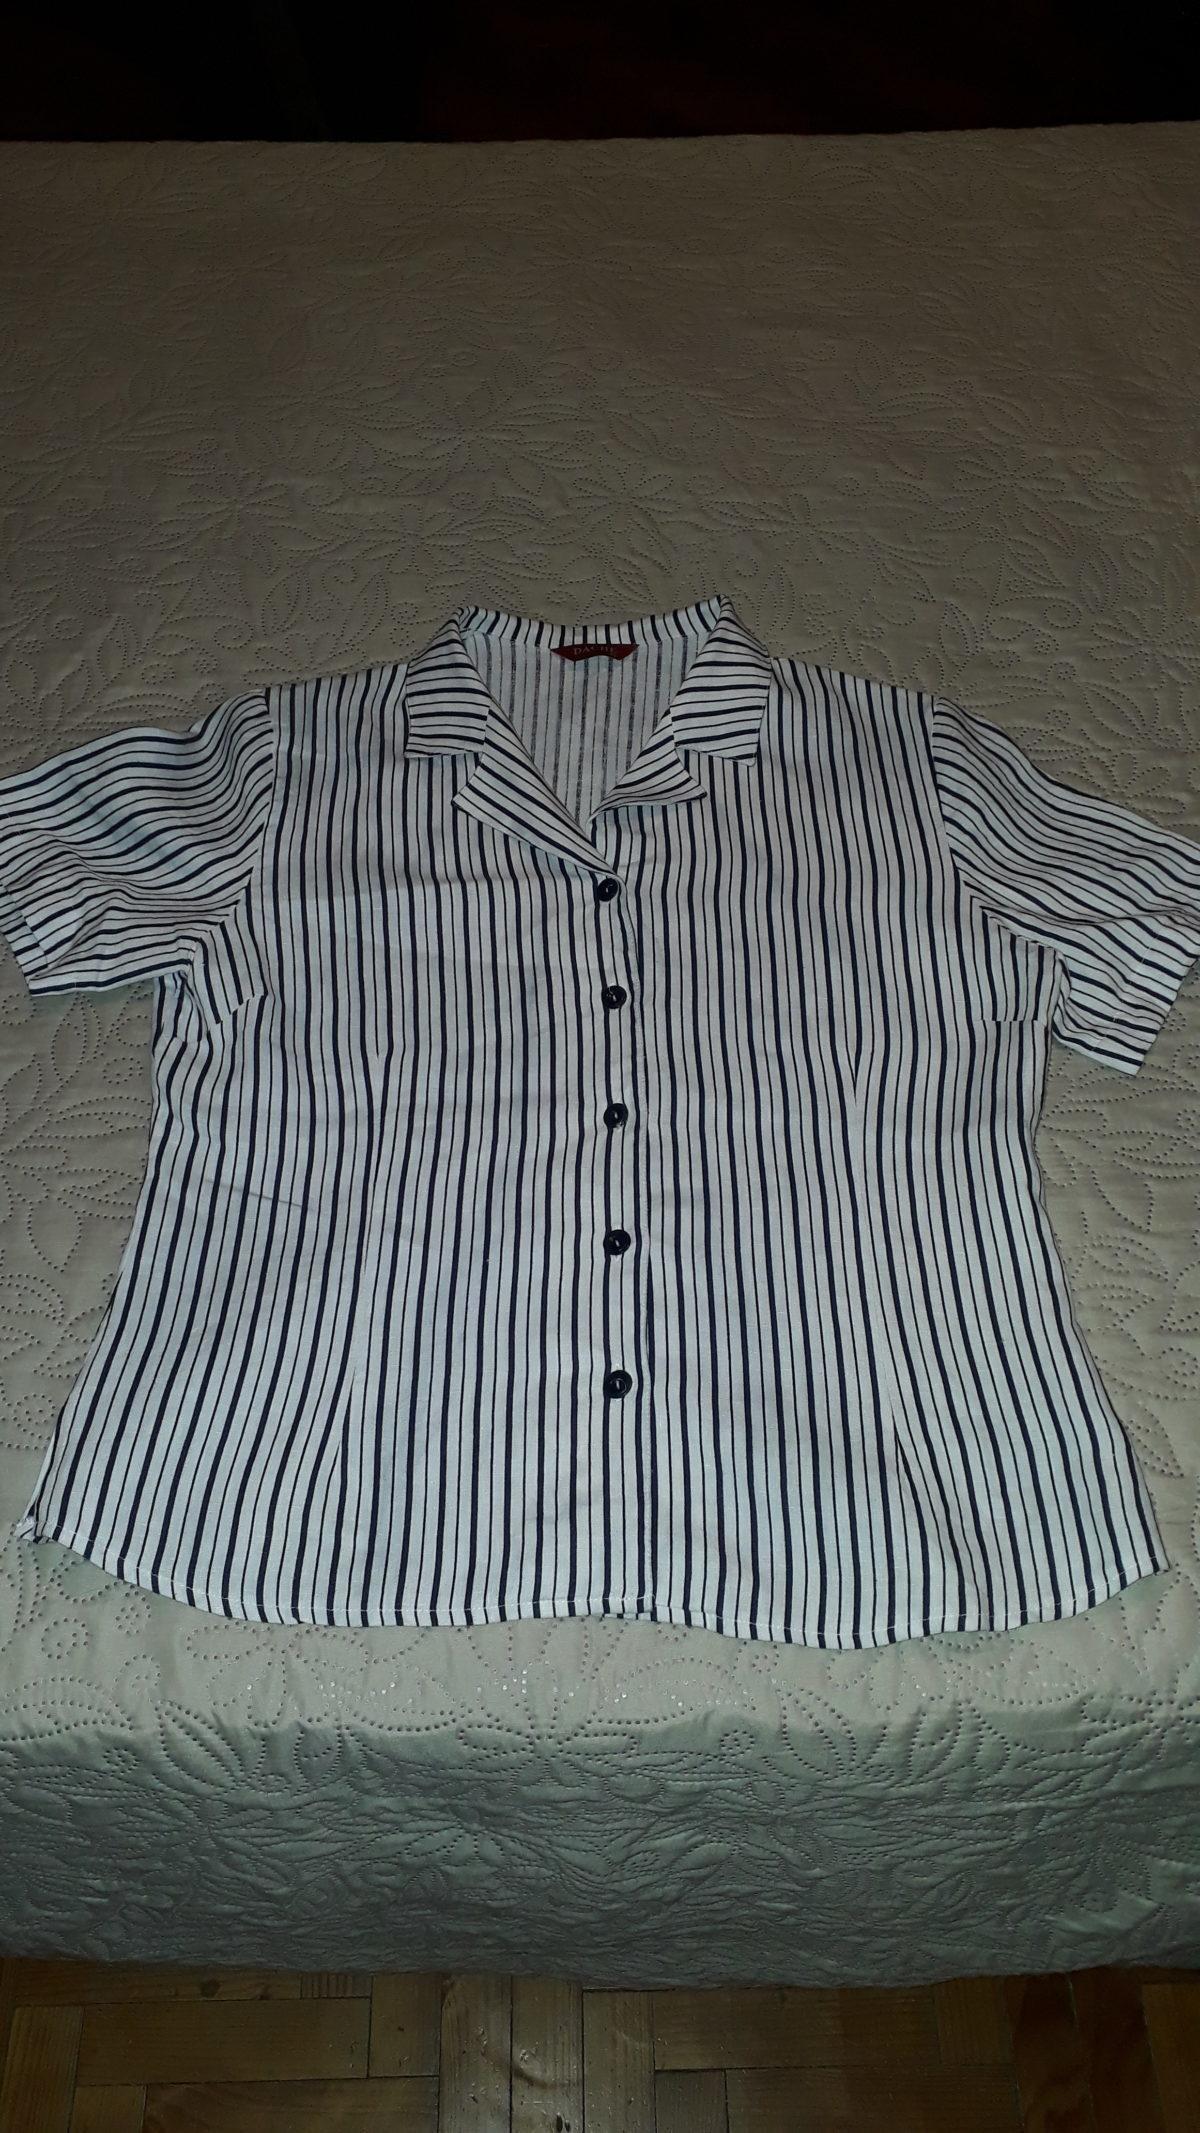 Camisa com manga curta 3